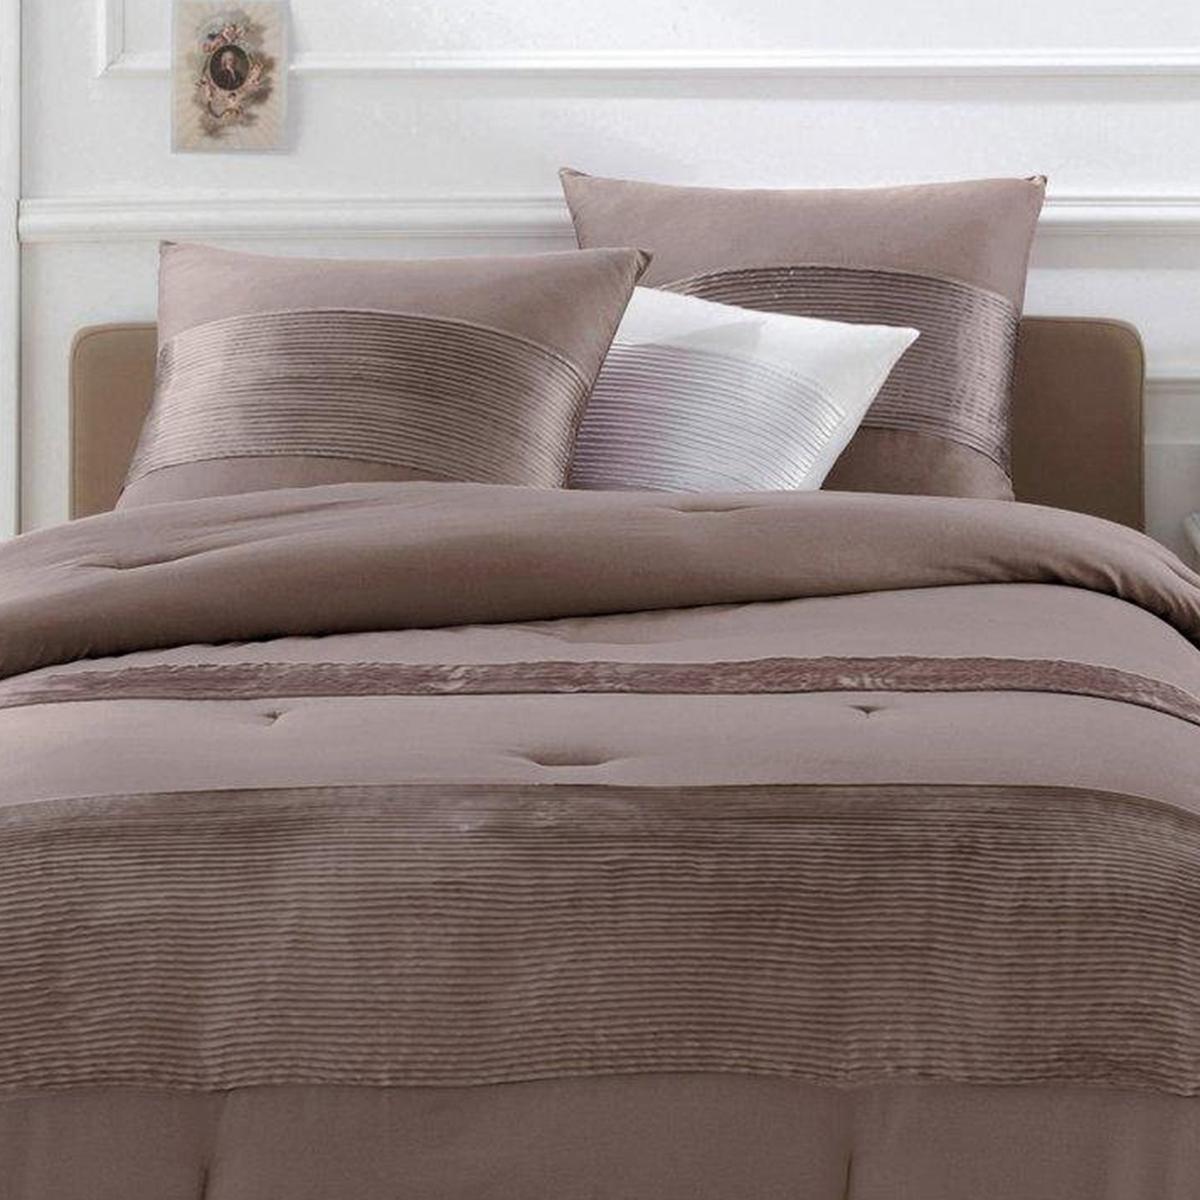 Чехол на подушку из хлопкового сатина, AEMI